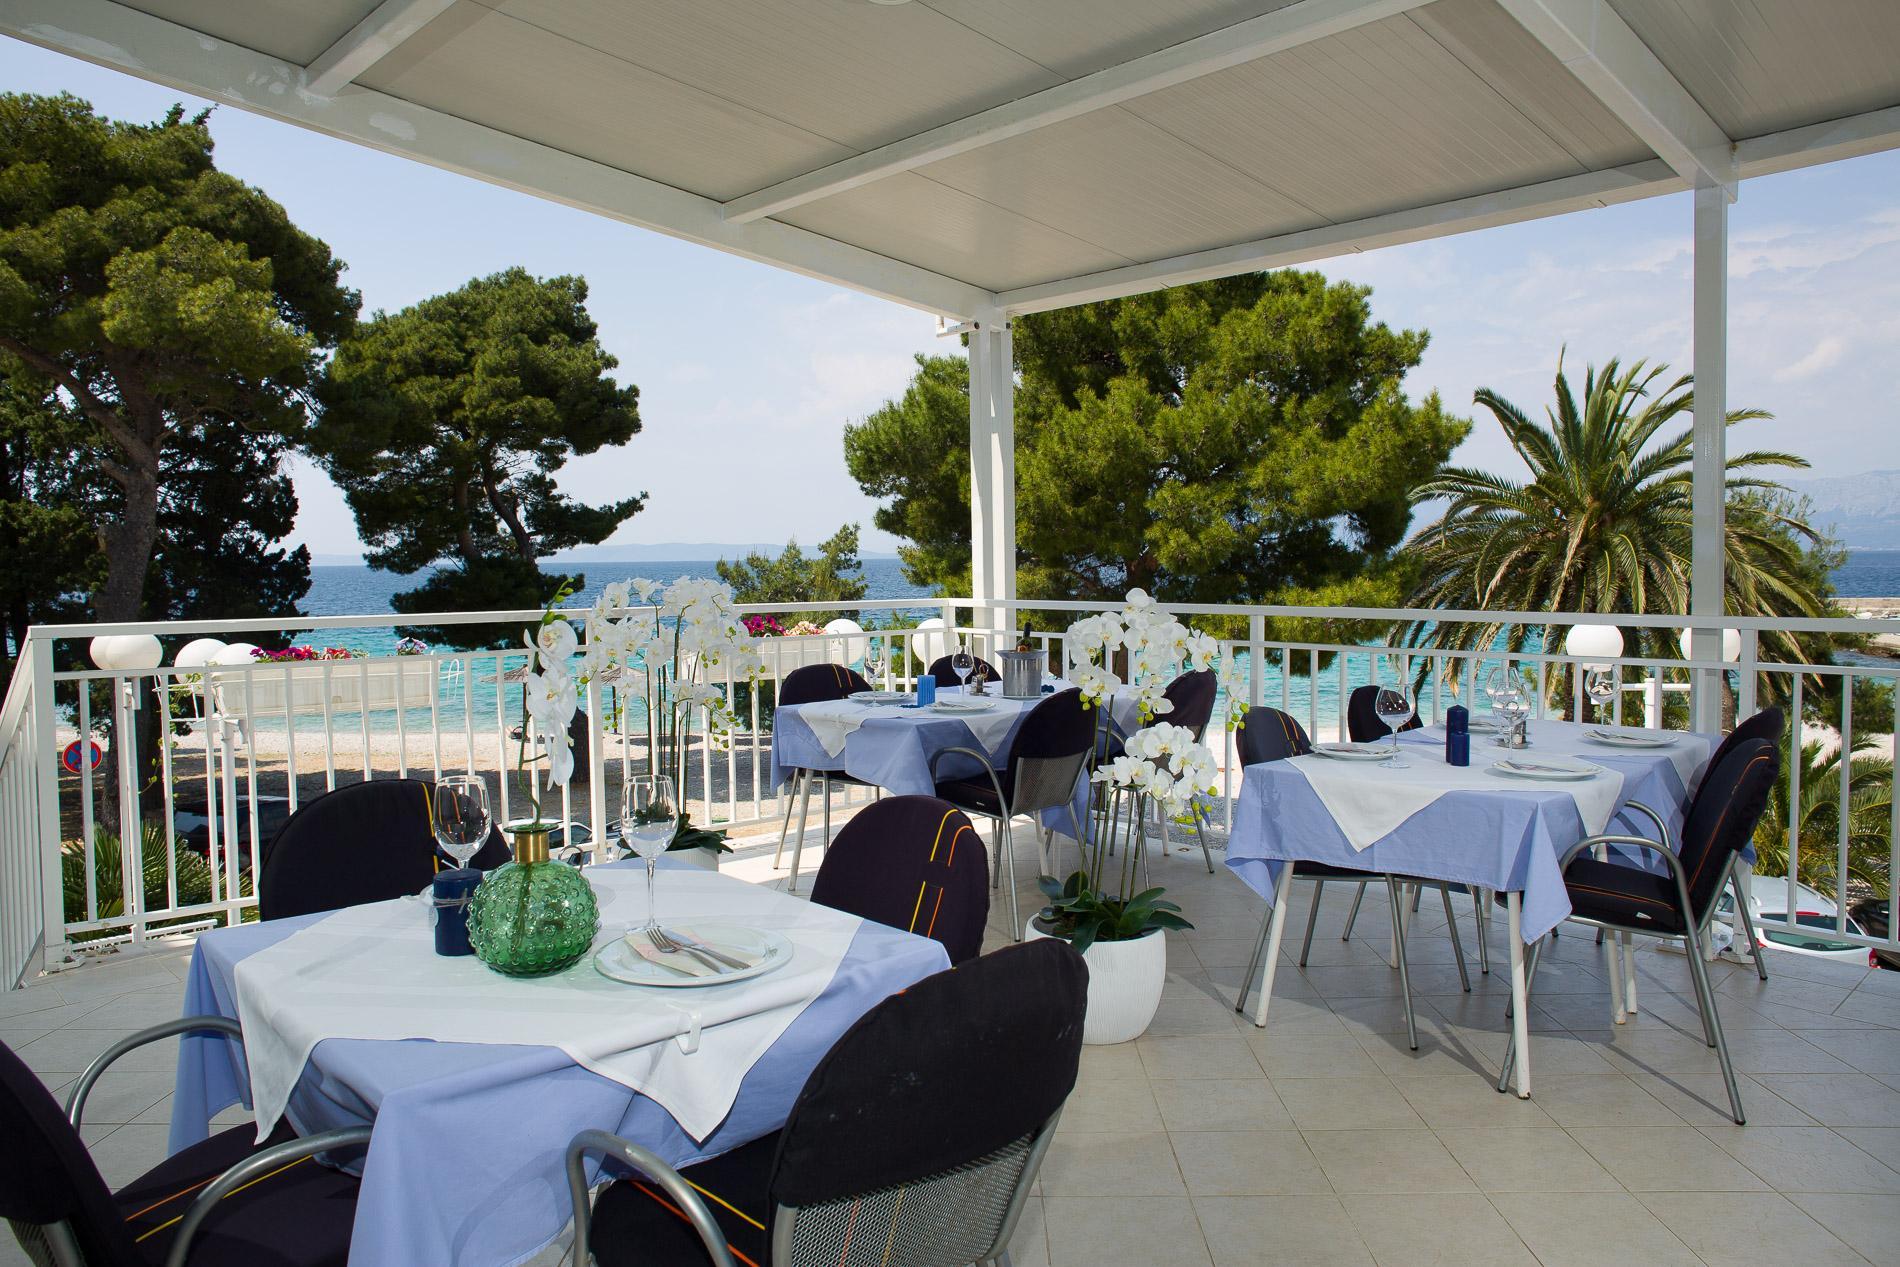 44_Restaurant terrace